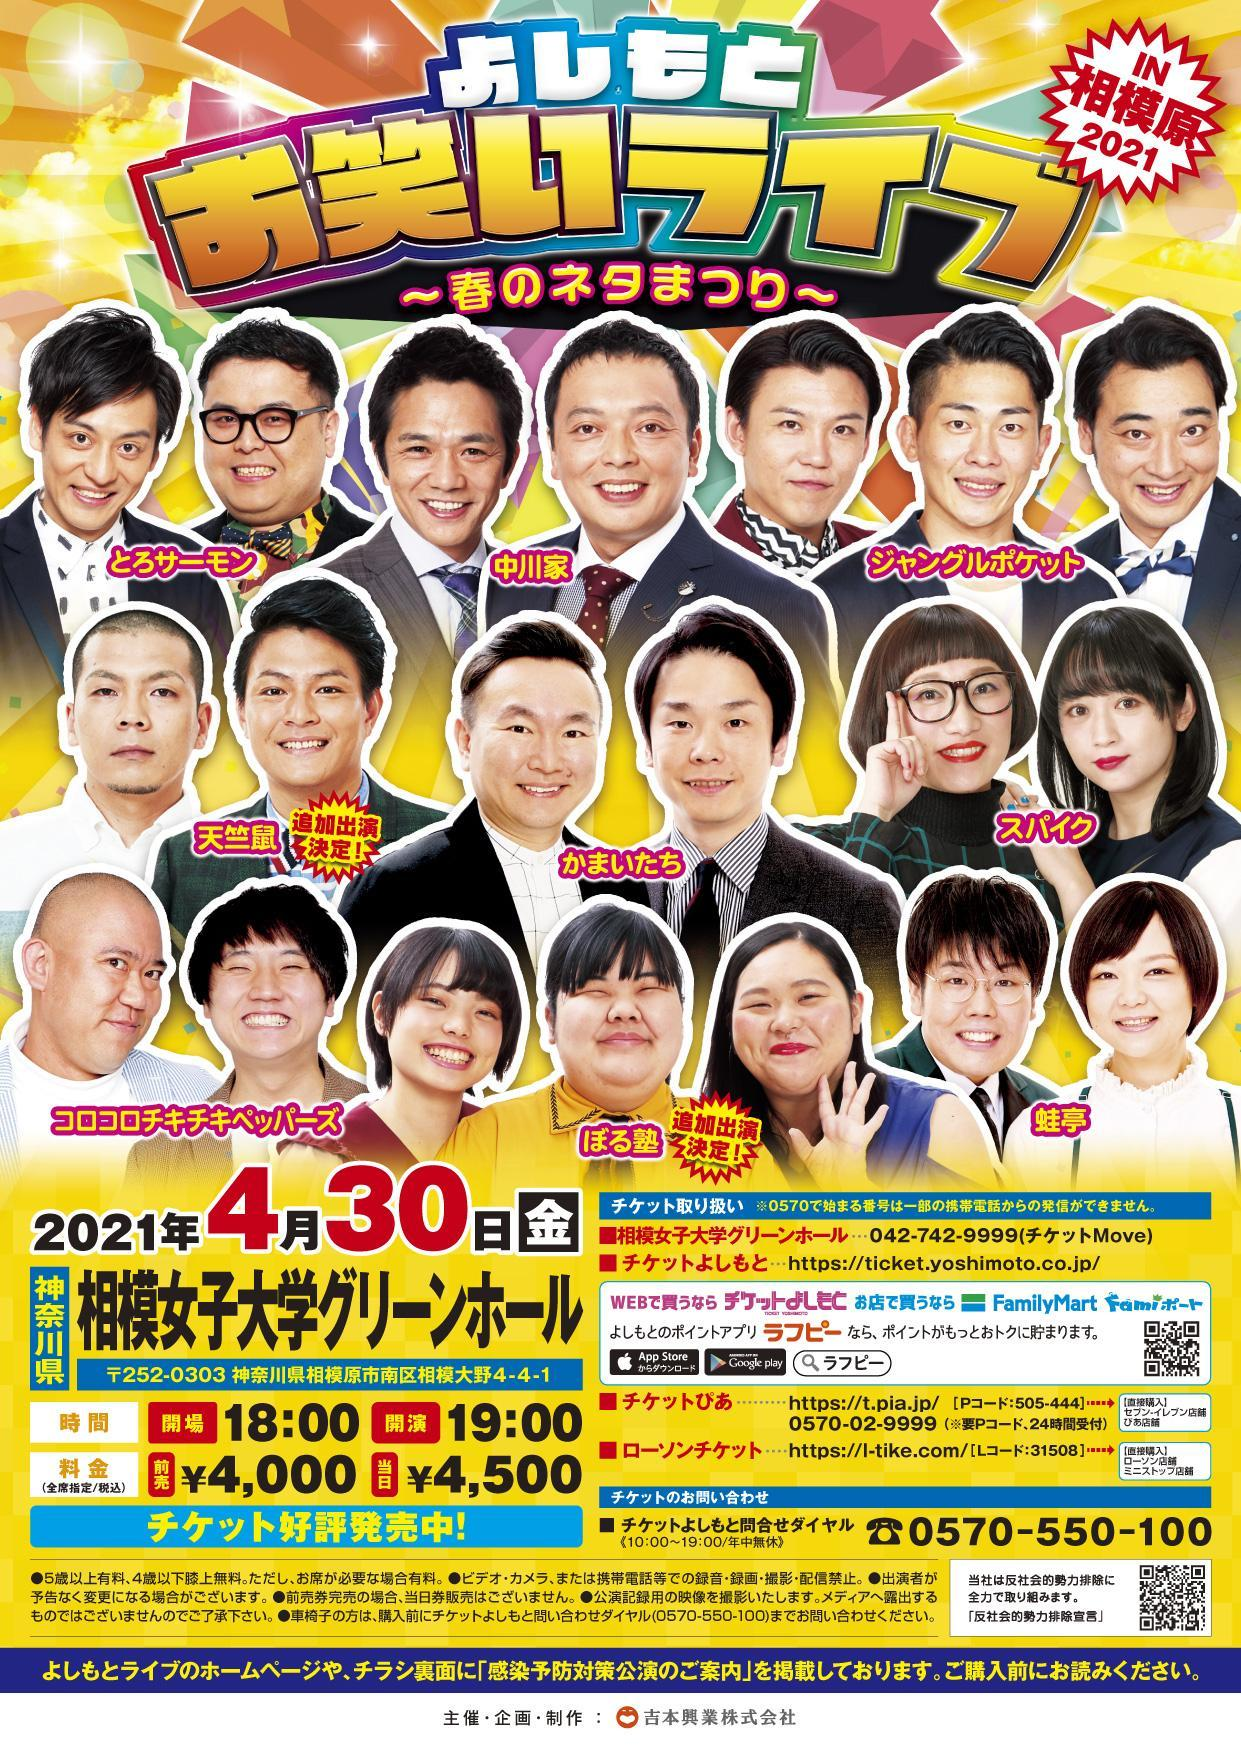 http://www.syumatsu.jp/20210322164638-78bc8aa44b1b8112396ed675f51cf29eff643c6f.jpg